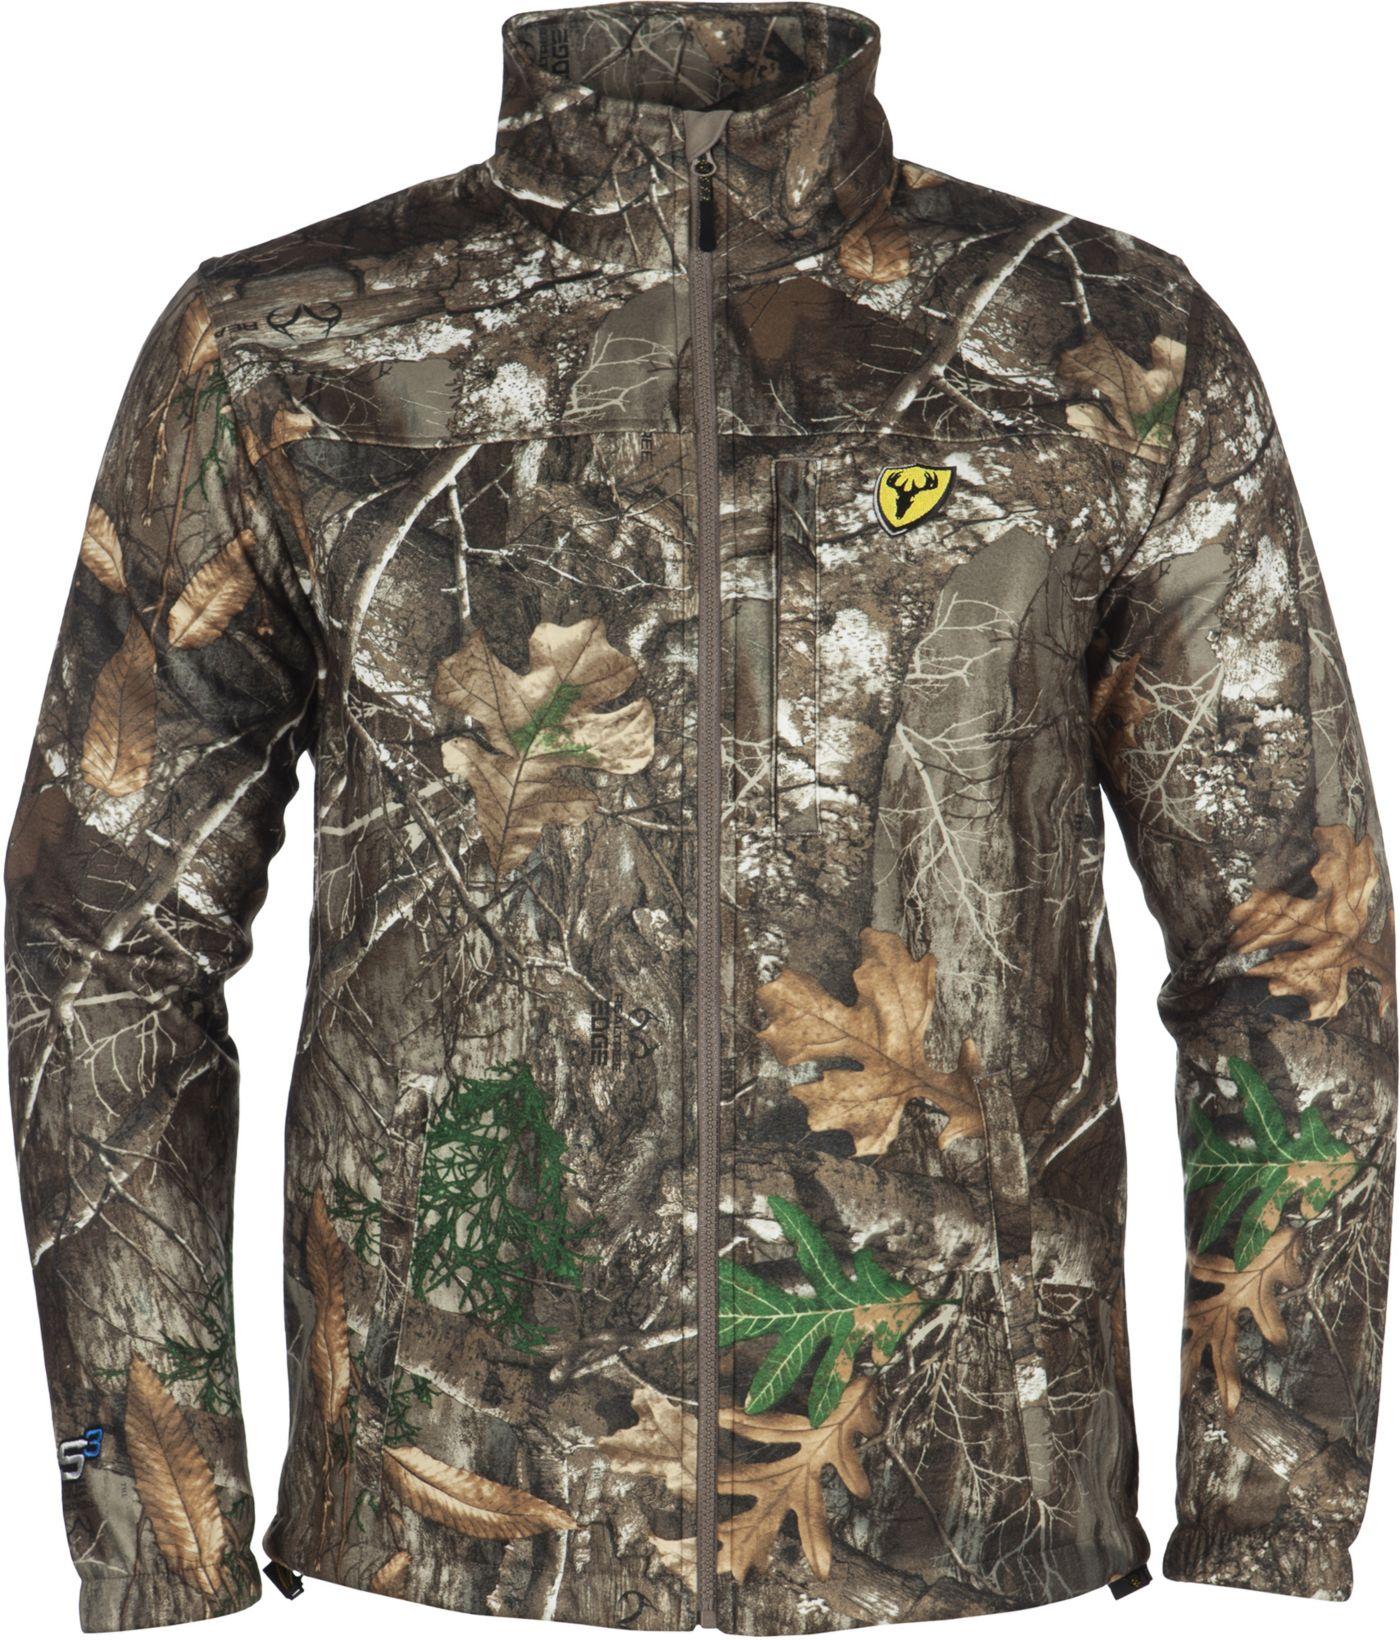 Blocker Outdoors Men's Shield Series Wooltex Jacket